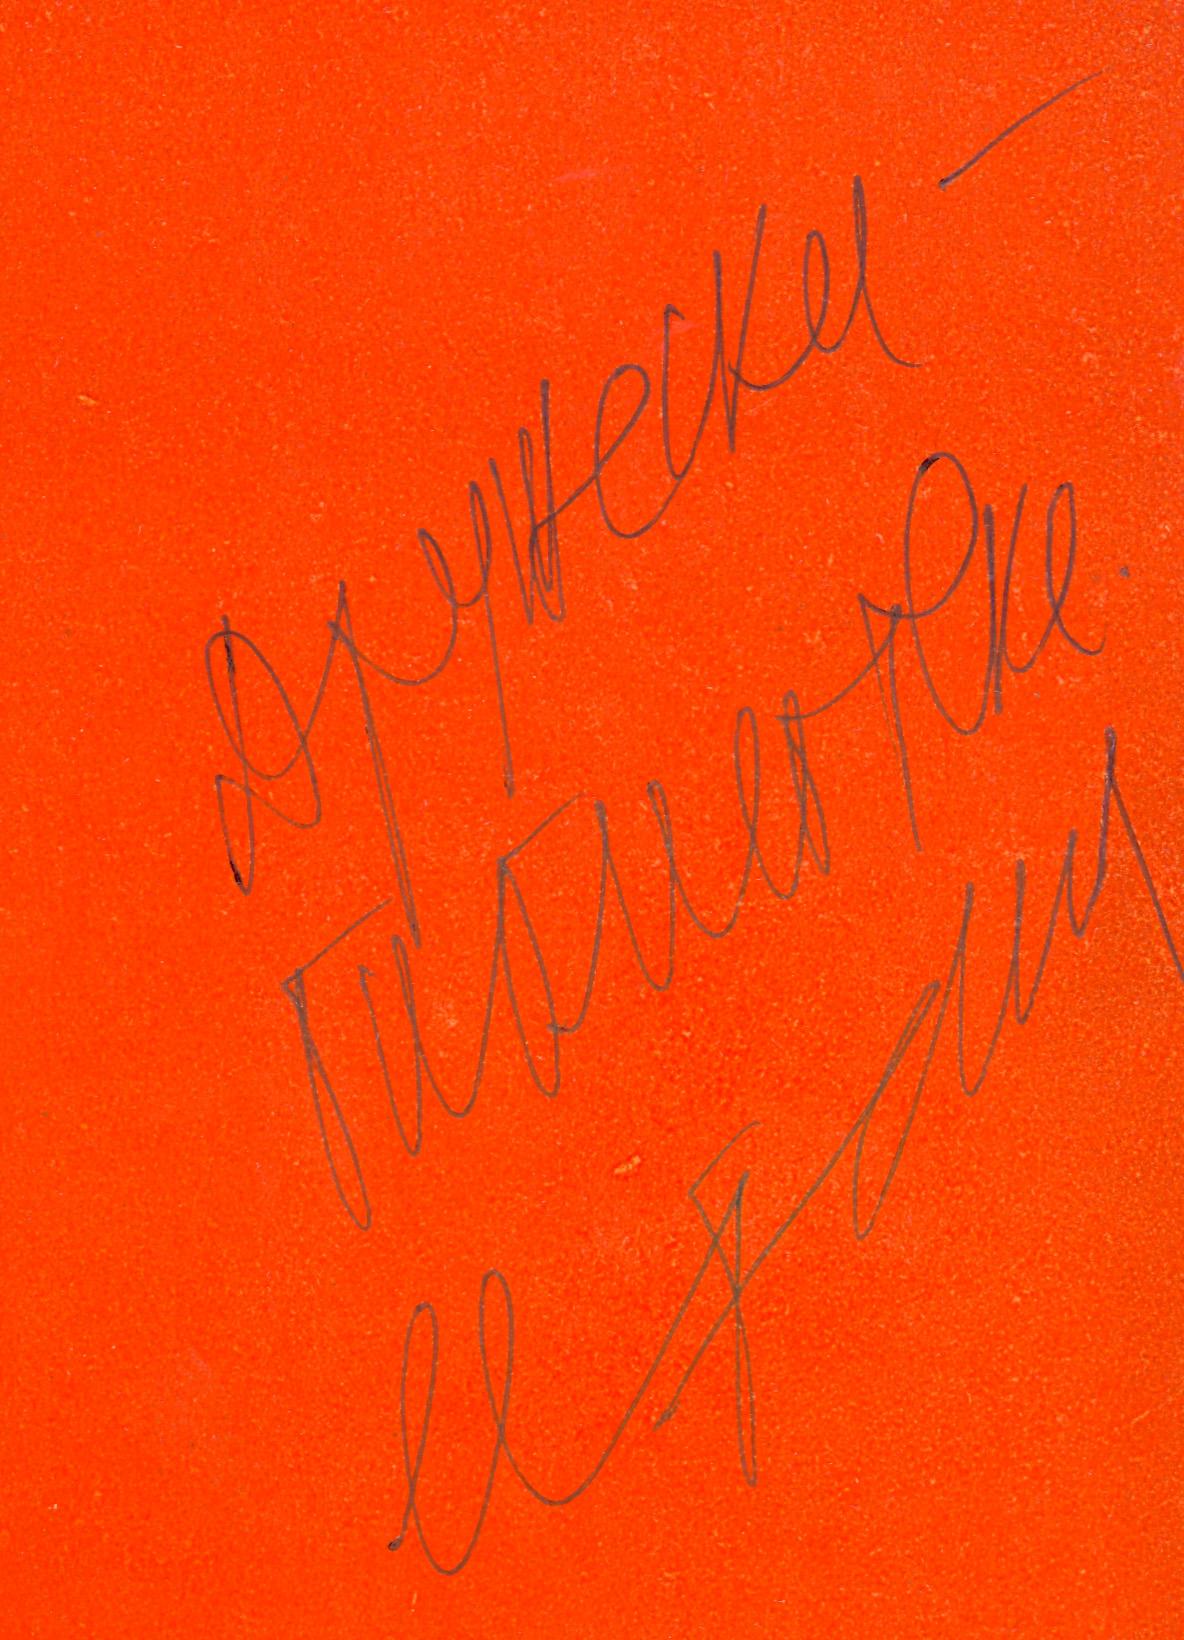 М. Гроссман Цыганок. Автограф на книге. ЧОЮБ